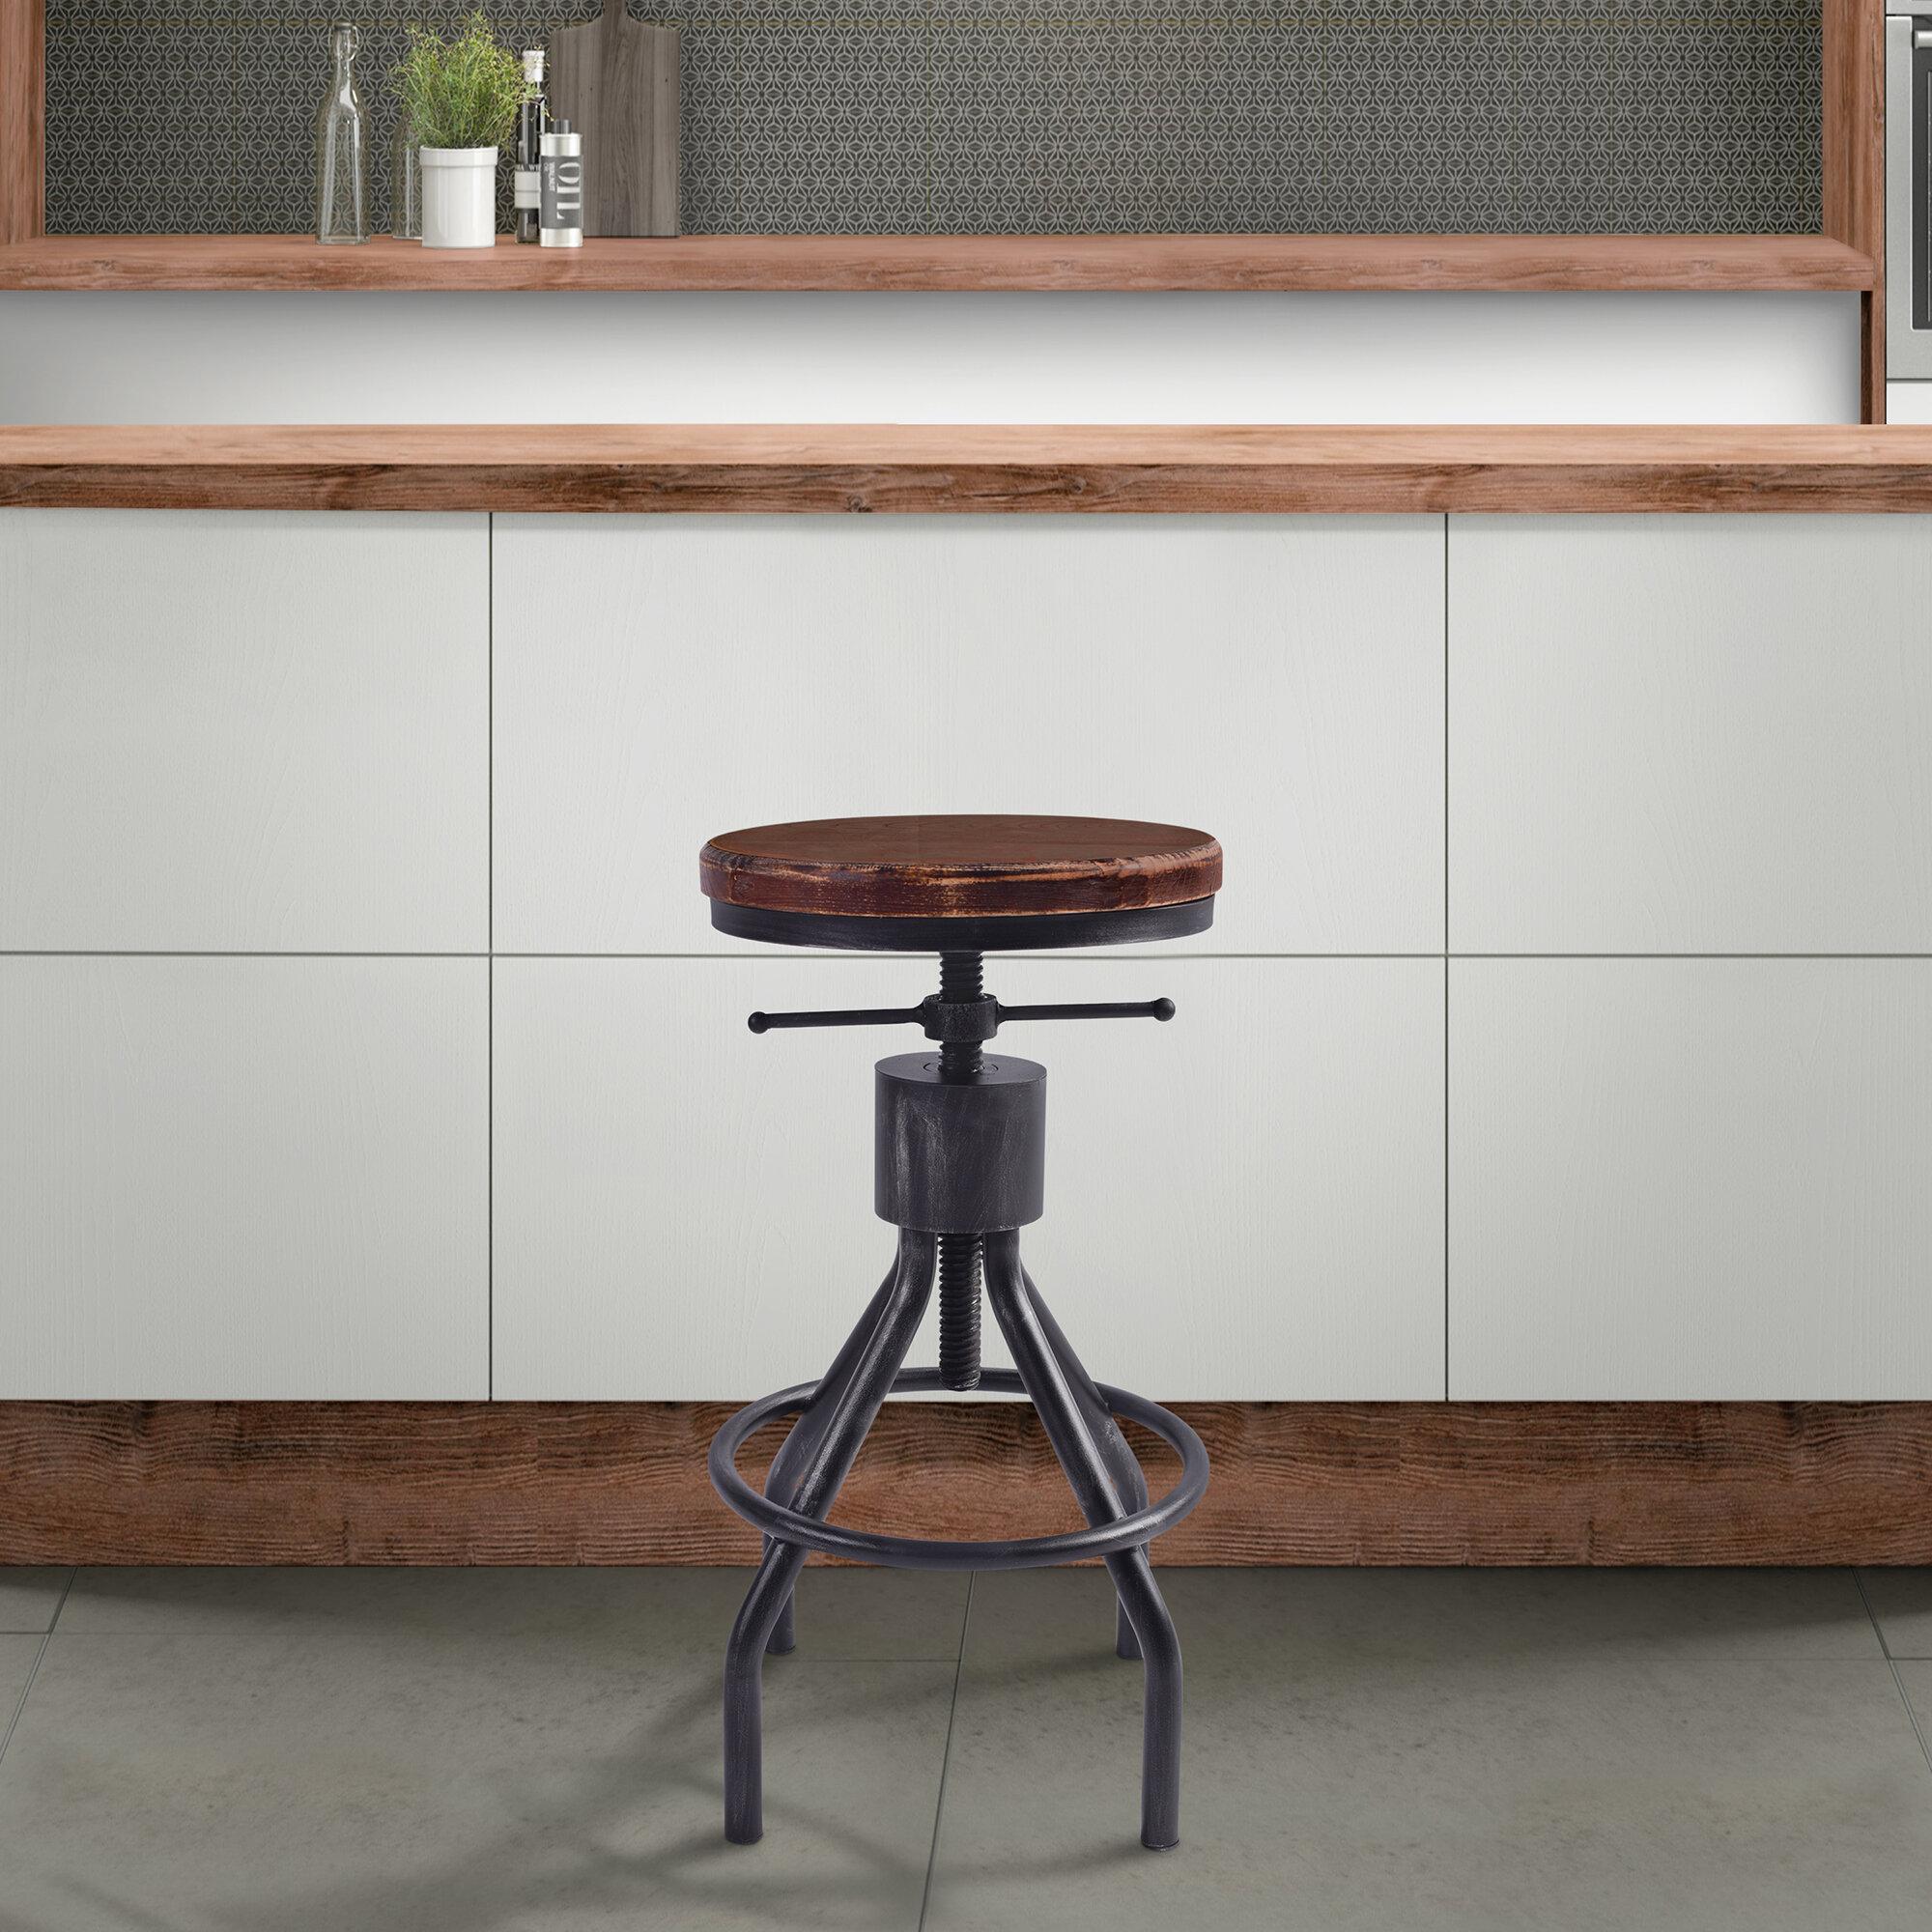 Strange 17 Stories Verdell Adjustable Height Swivel Bar Stool Alphanode Cool Chair Designs And Ideas Alphanodeonline